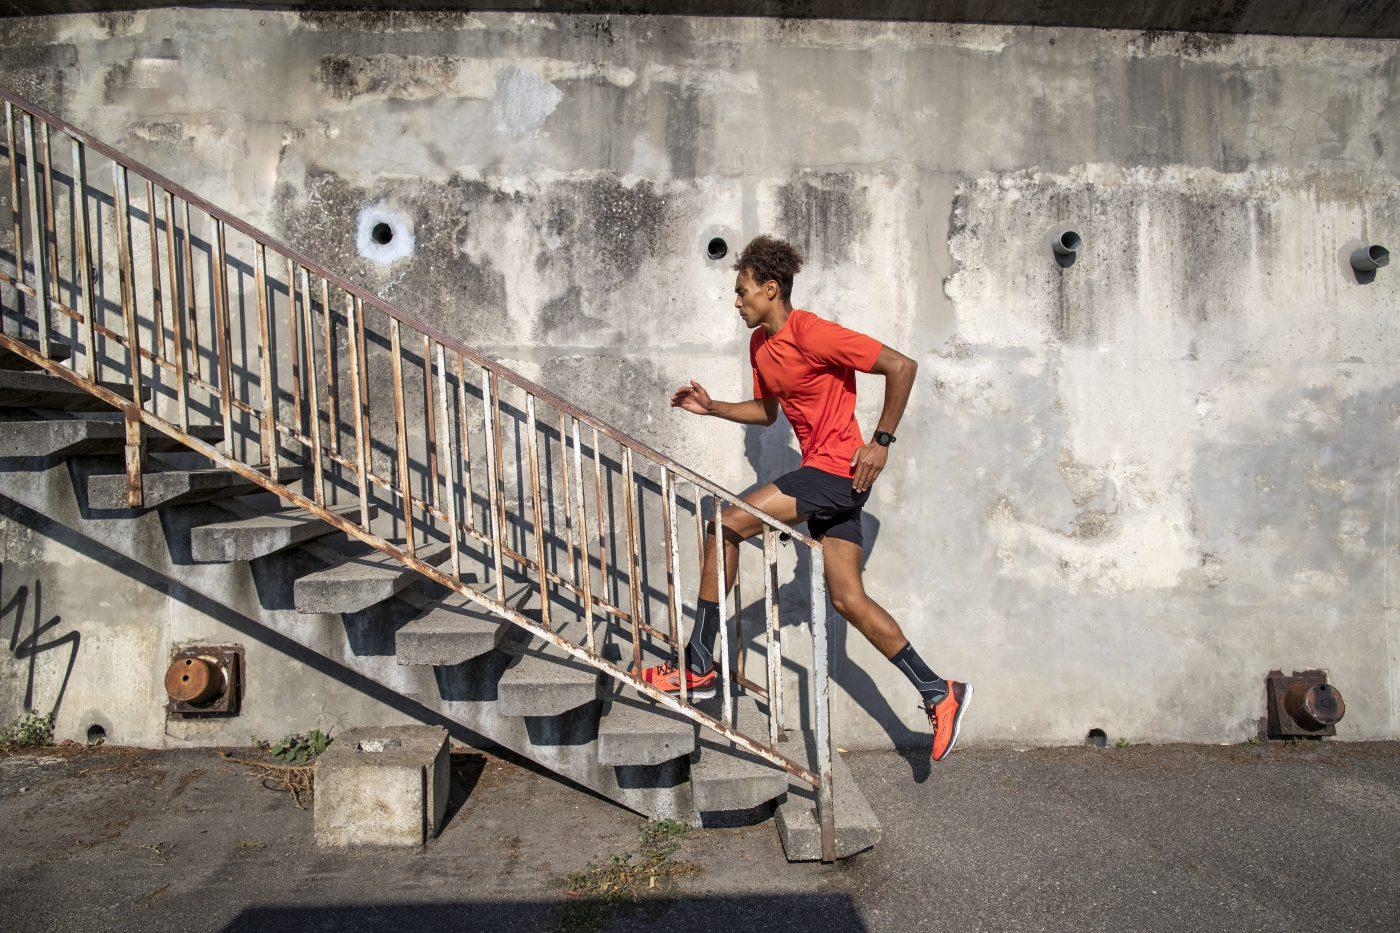 decathlon-kiprun-care-hommes-running-runpack